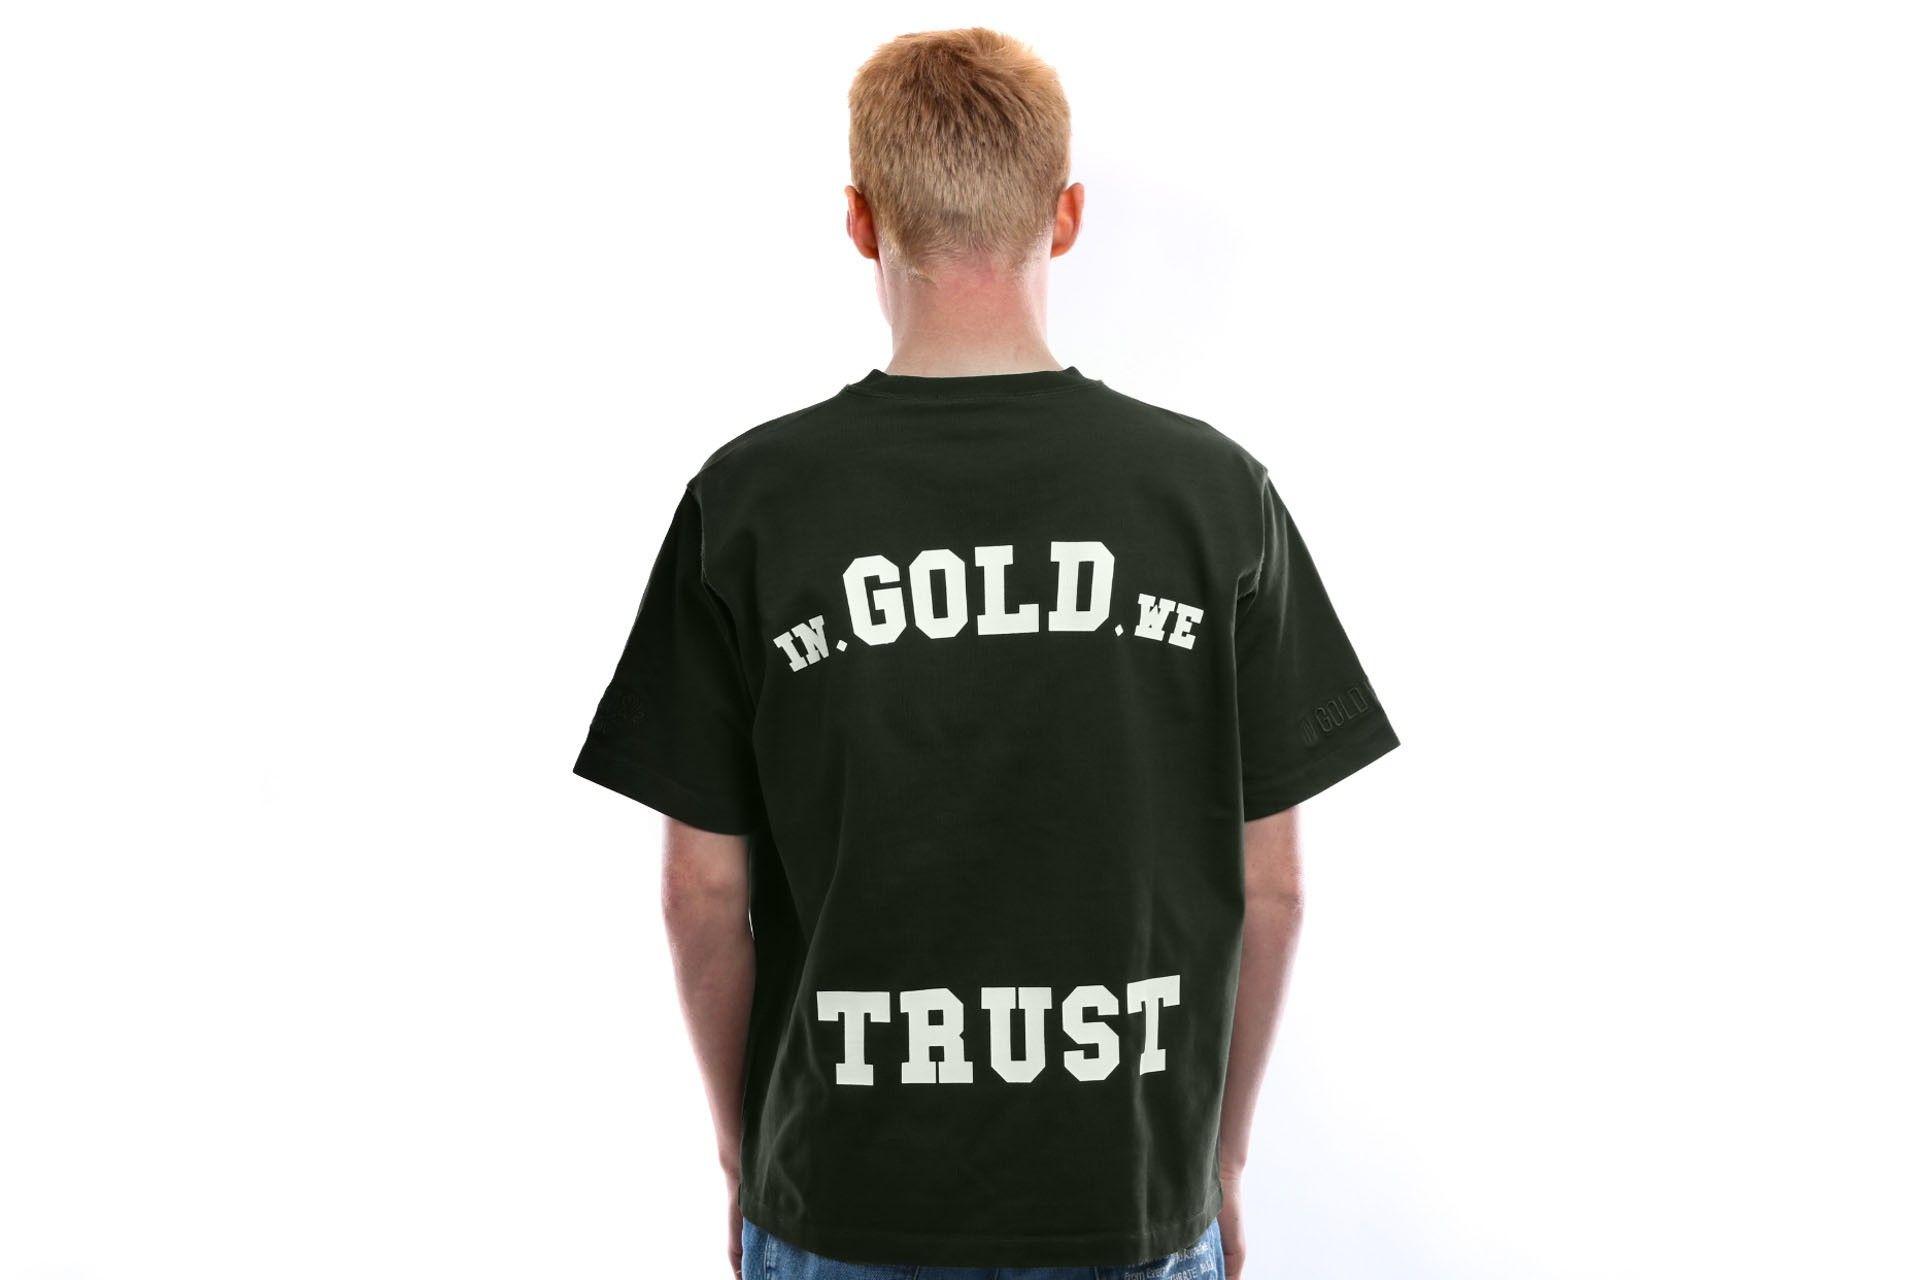 Afbeelding van In Gold We Trust T Shirt Overside Tee Basic Print Black Print Frond Kombu green IGWT-003